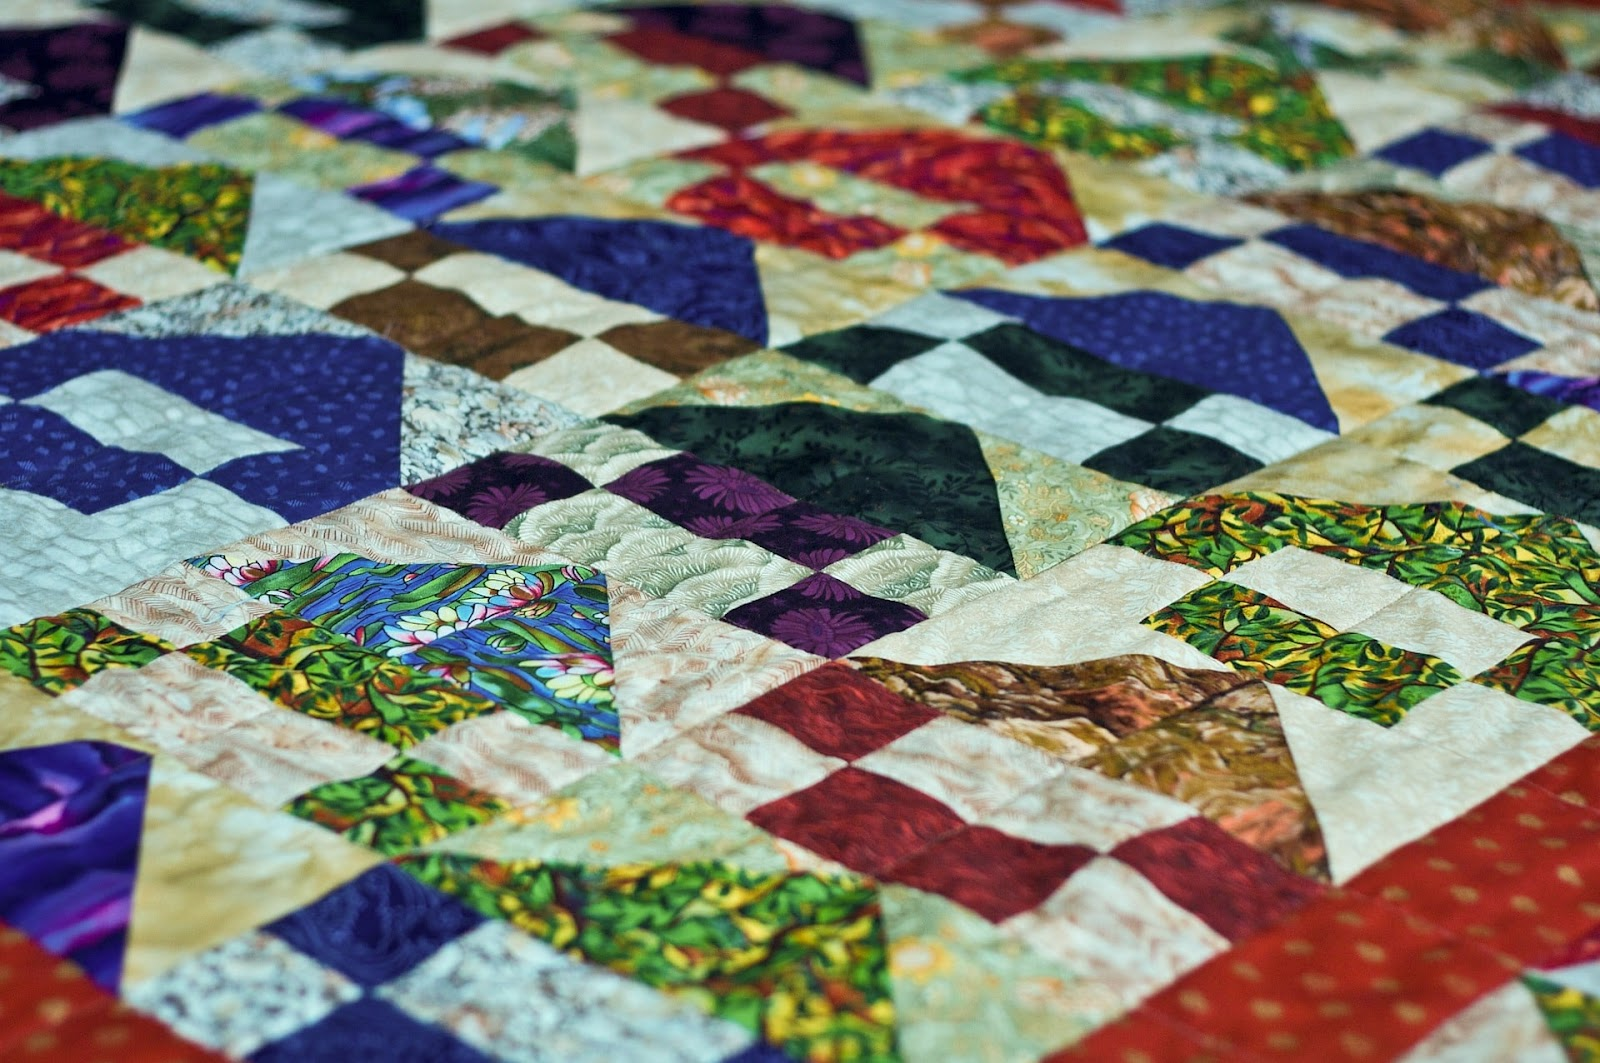 Manualidades patchwork artesania. Reciclar ropa